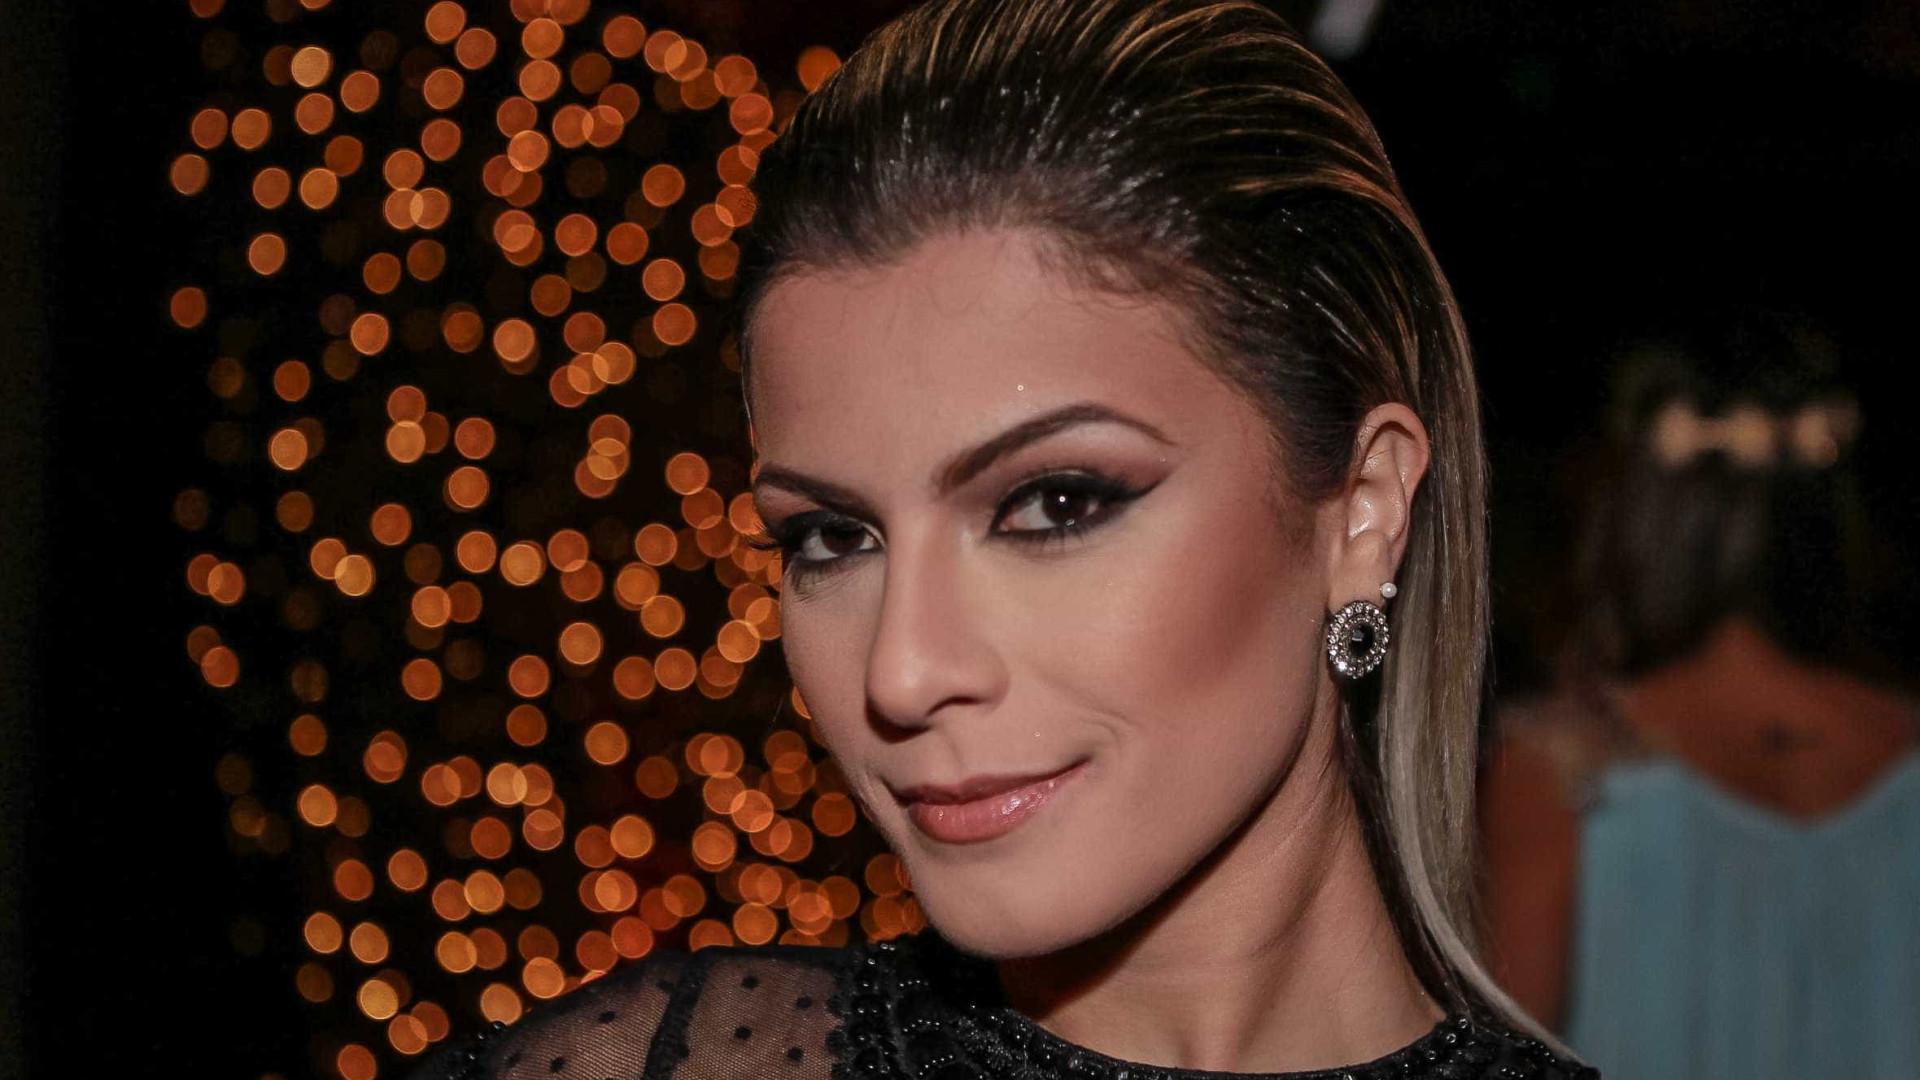 Babi Rossi diz que nunca foi garota de programa: 'Má fama atrapalha'